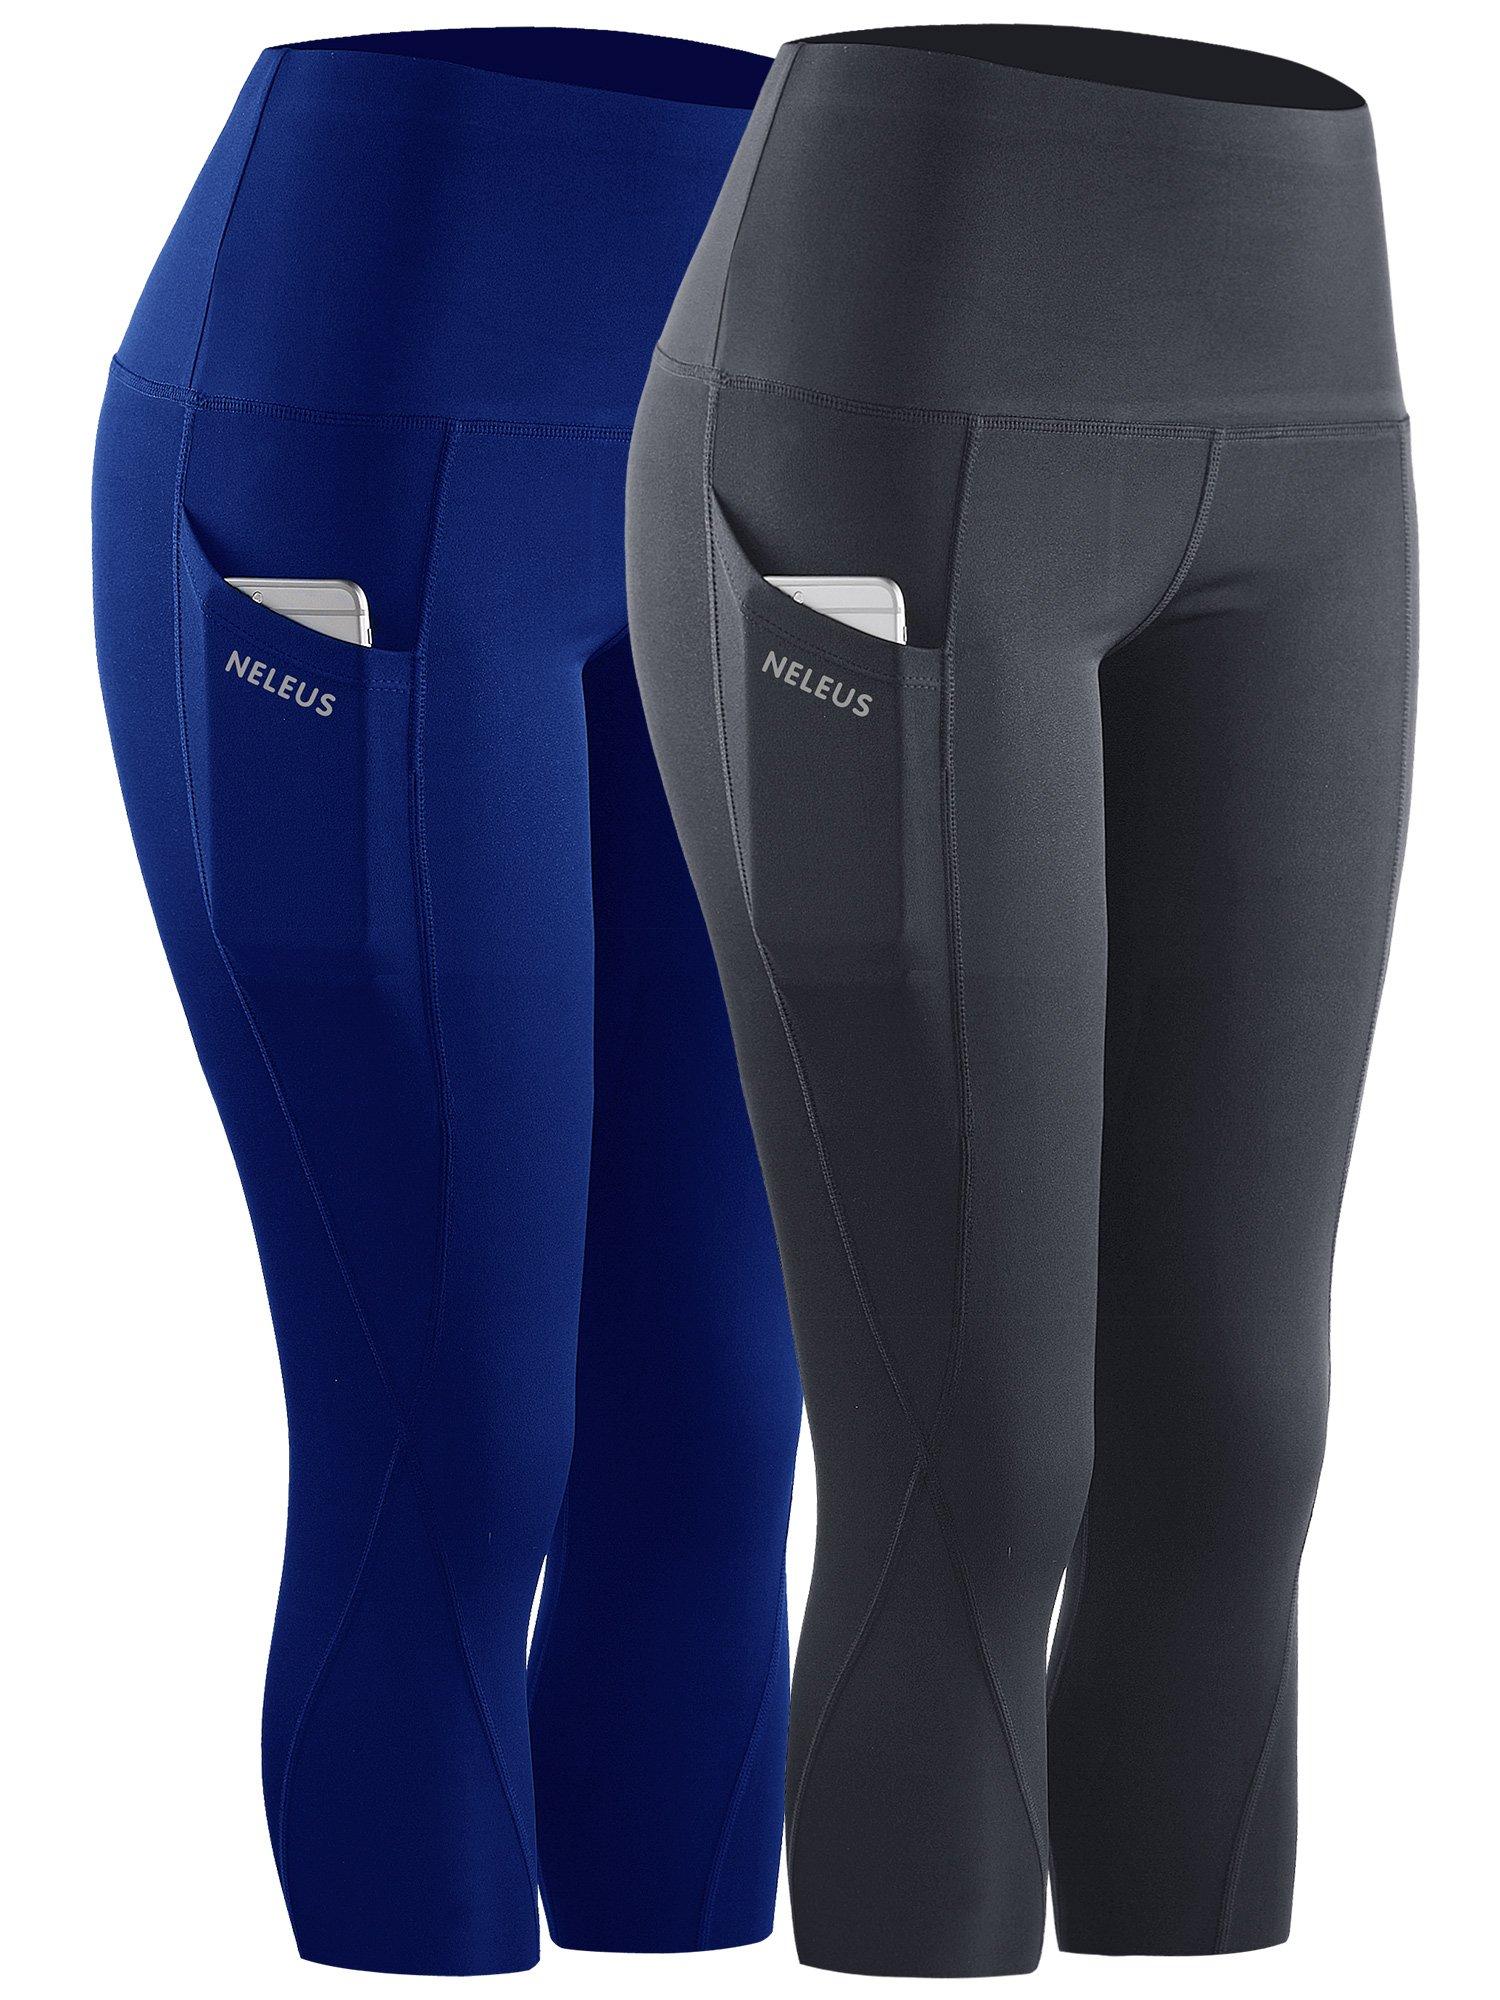 Neleus 2 Pack Tummy Control High Waist Workout Yoga Capri Leggings,9027,Grey,Blue,S,EU M